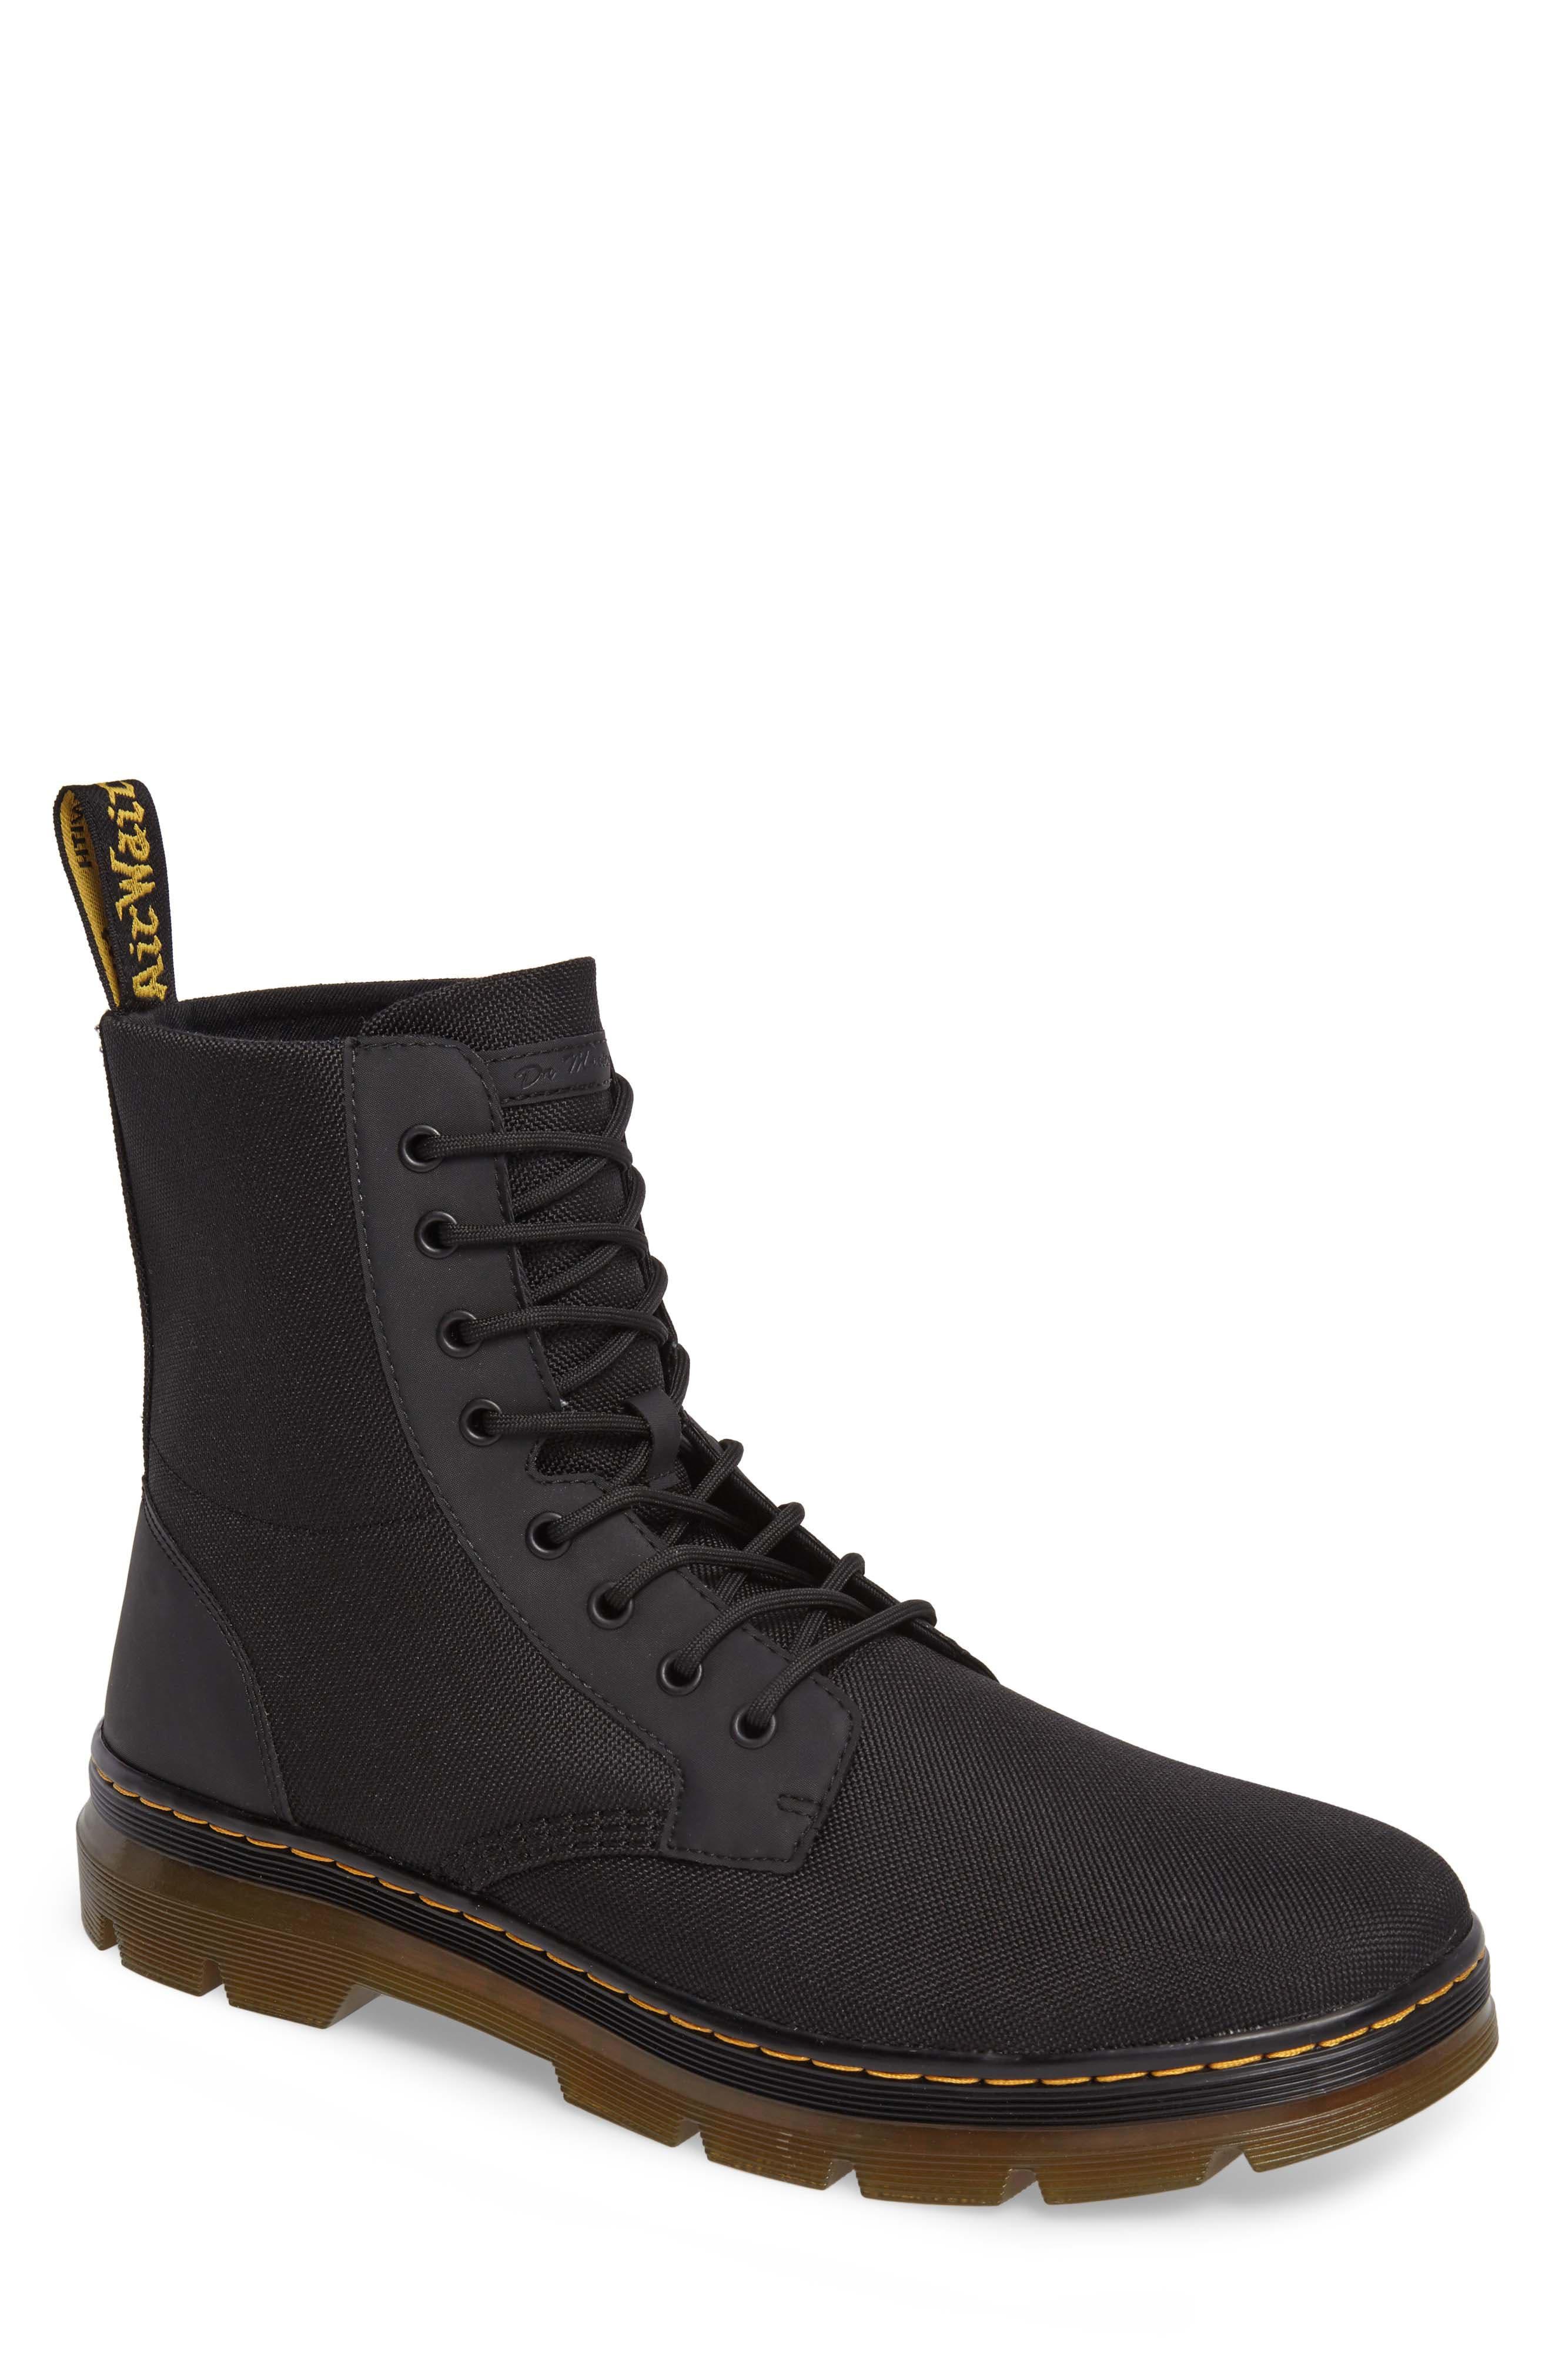 'Combs' Plain Toe Boot,                             Main thumbnail 1, color,                             001